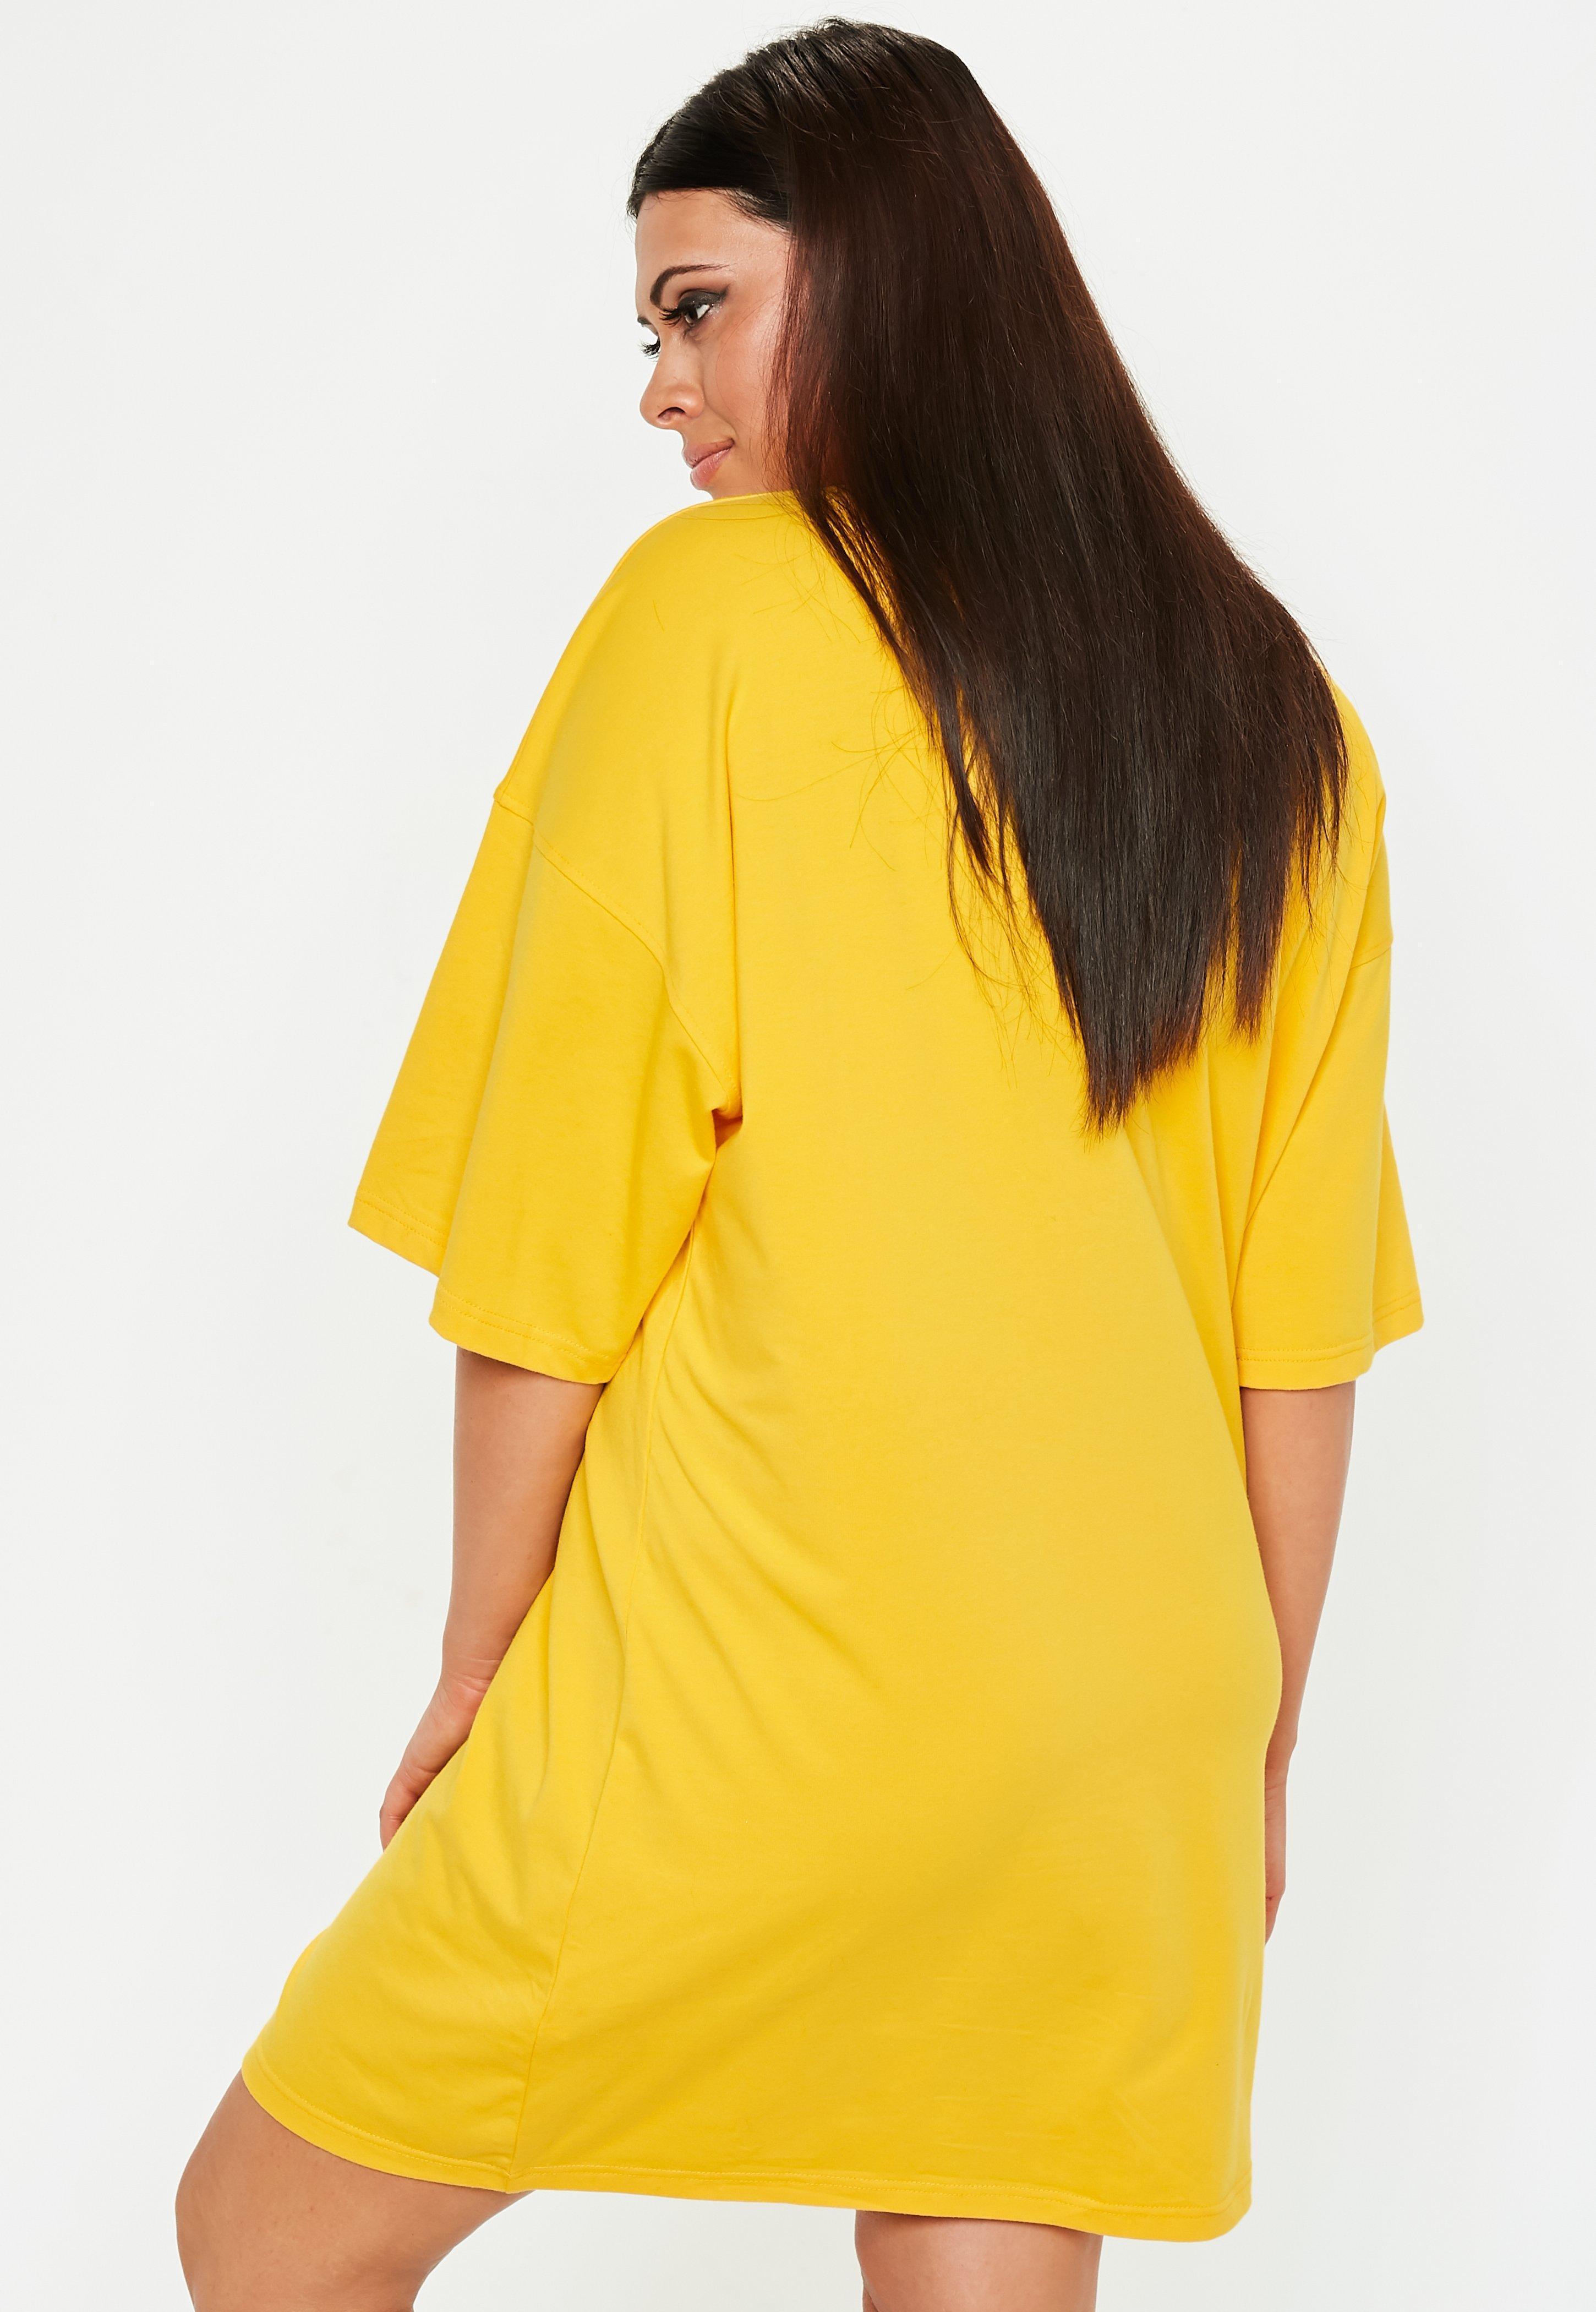 Gallery. Women s Yellow Dresses Women s T Shirt Dresses Women s Slogan ... 8fcd874cb